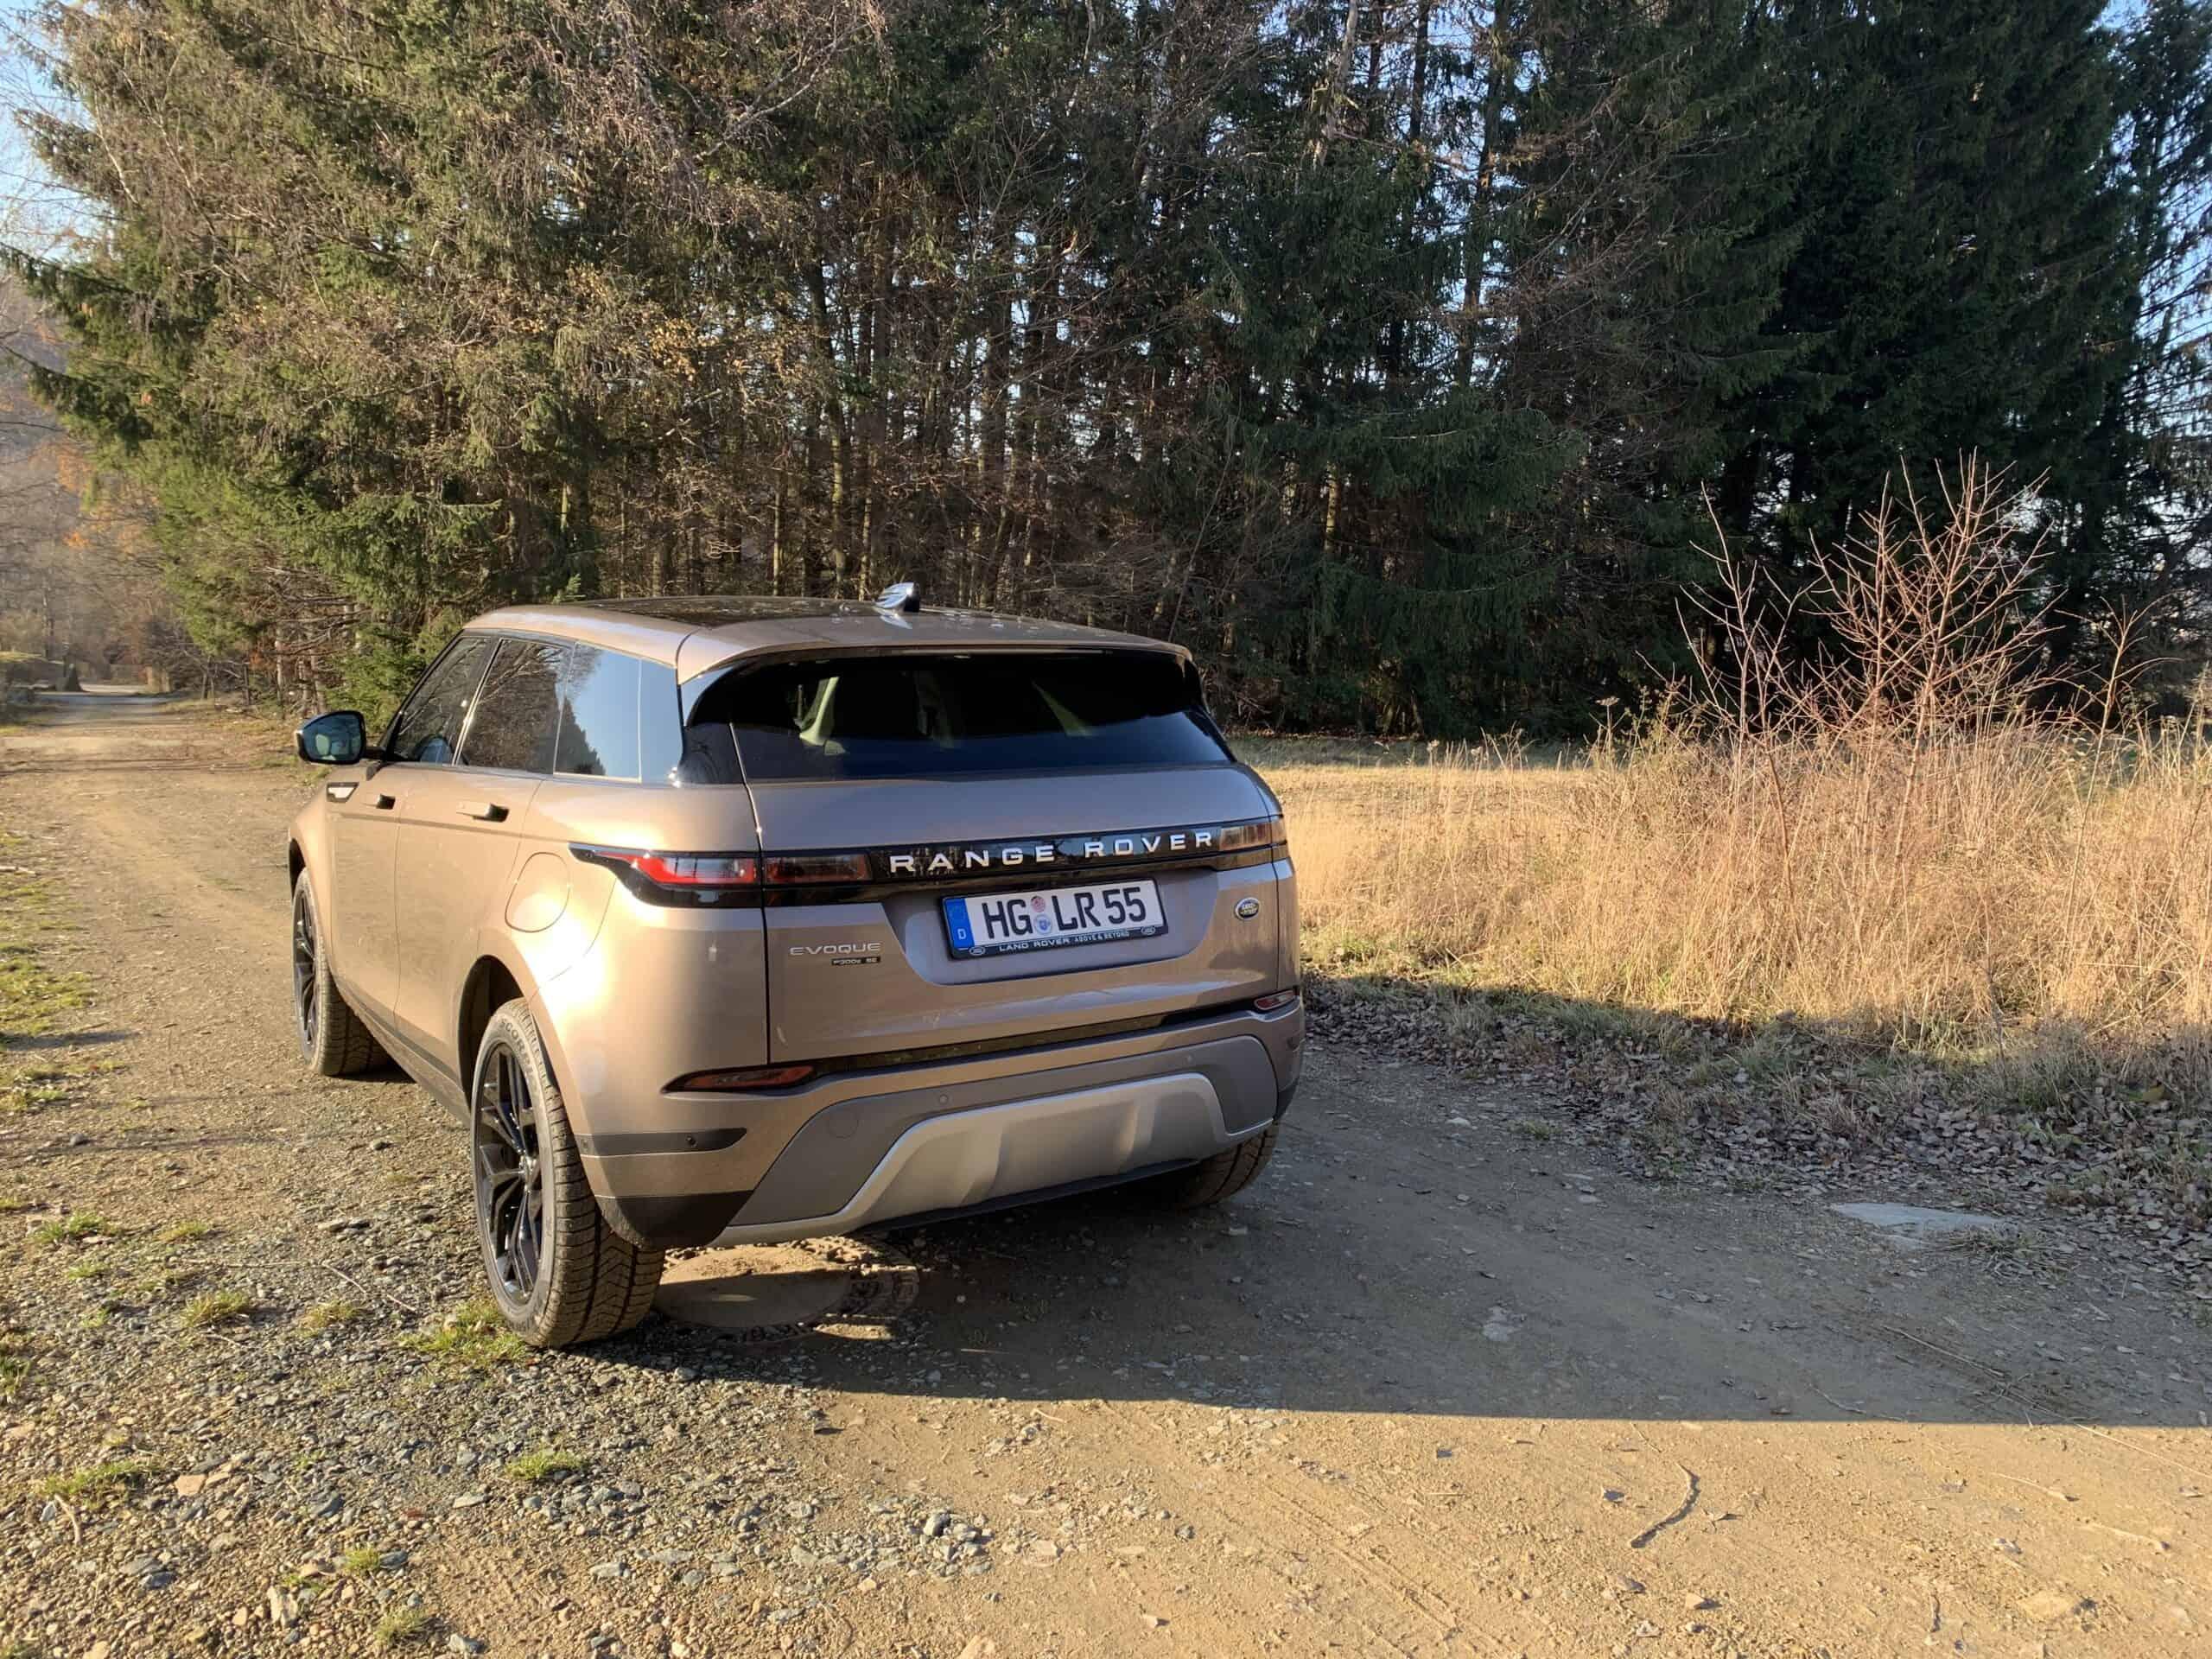 Range Rover Evoque PHEV (2021) - Kompaktes Design-SUV mit Plug-in-Hybrid-Antrieb